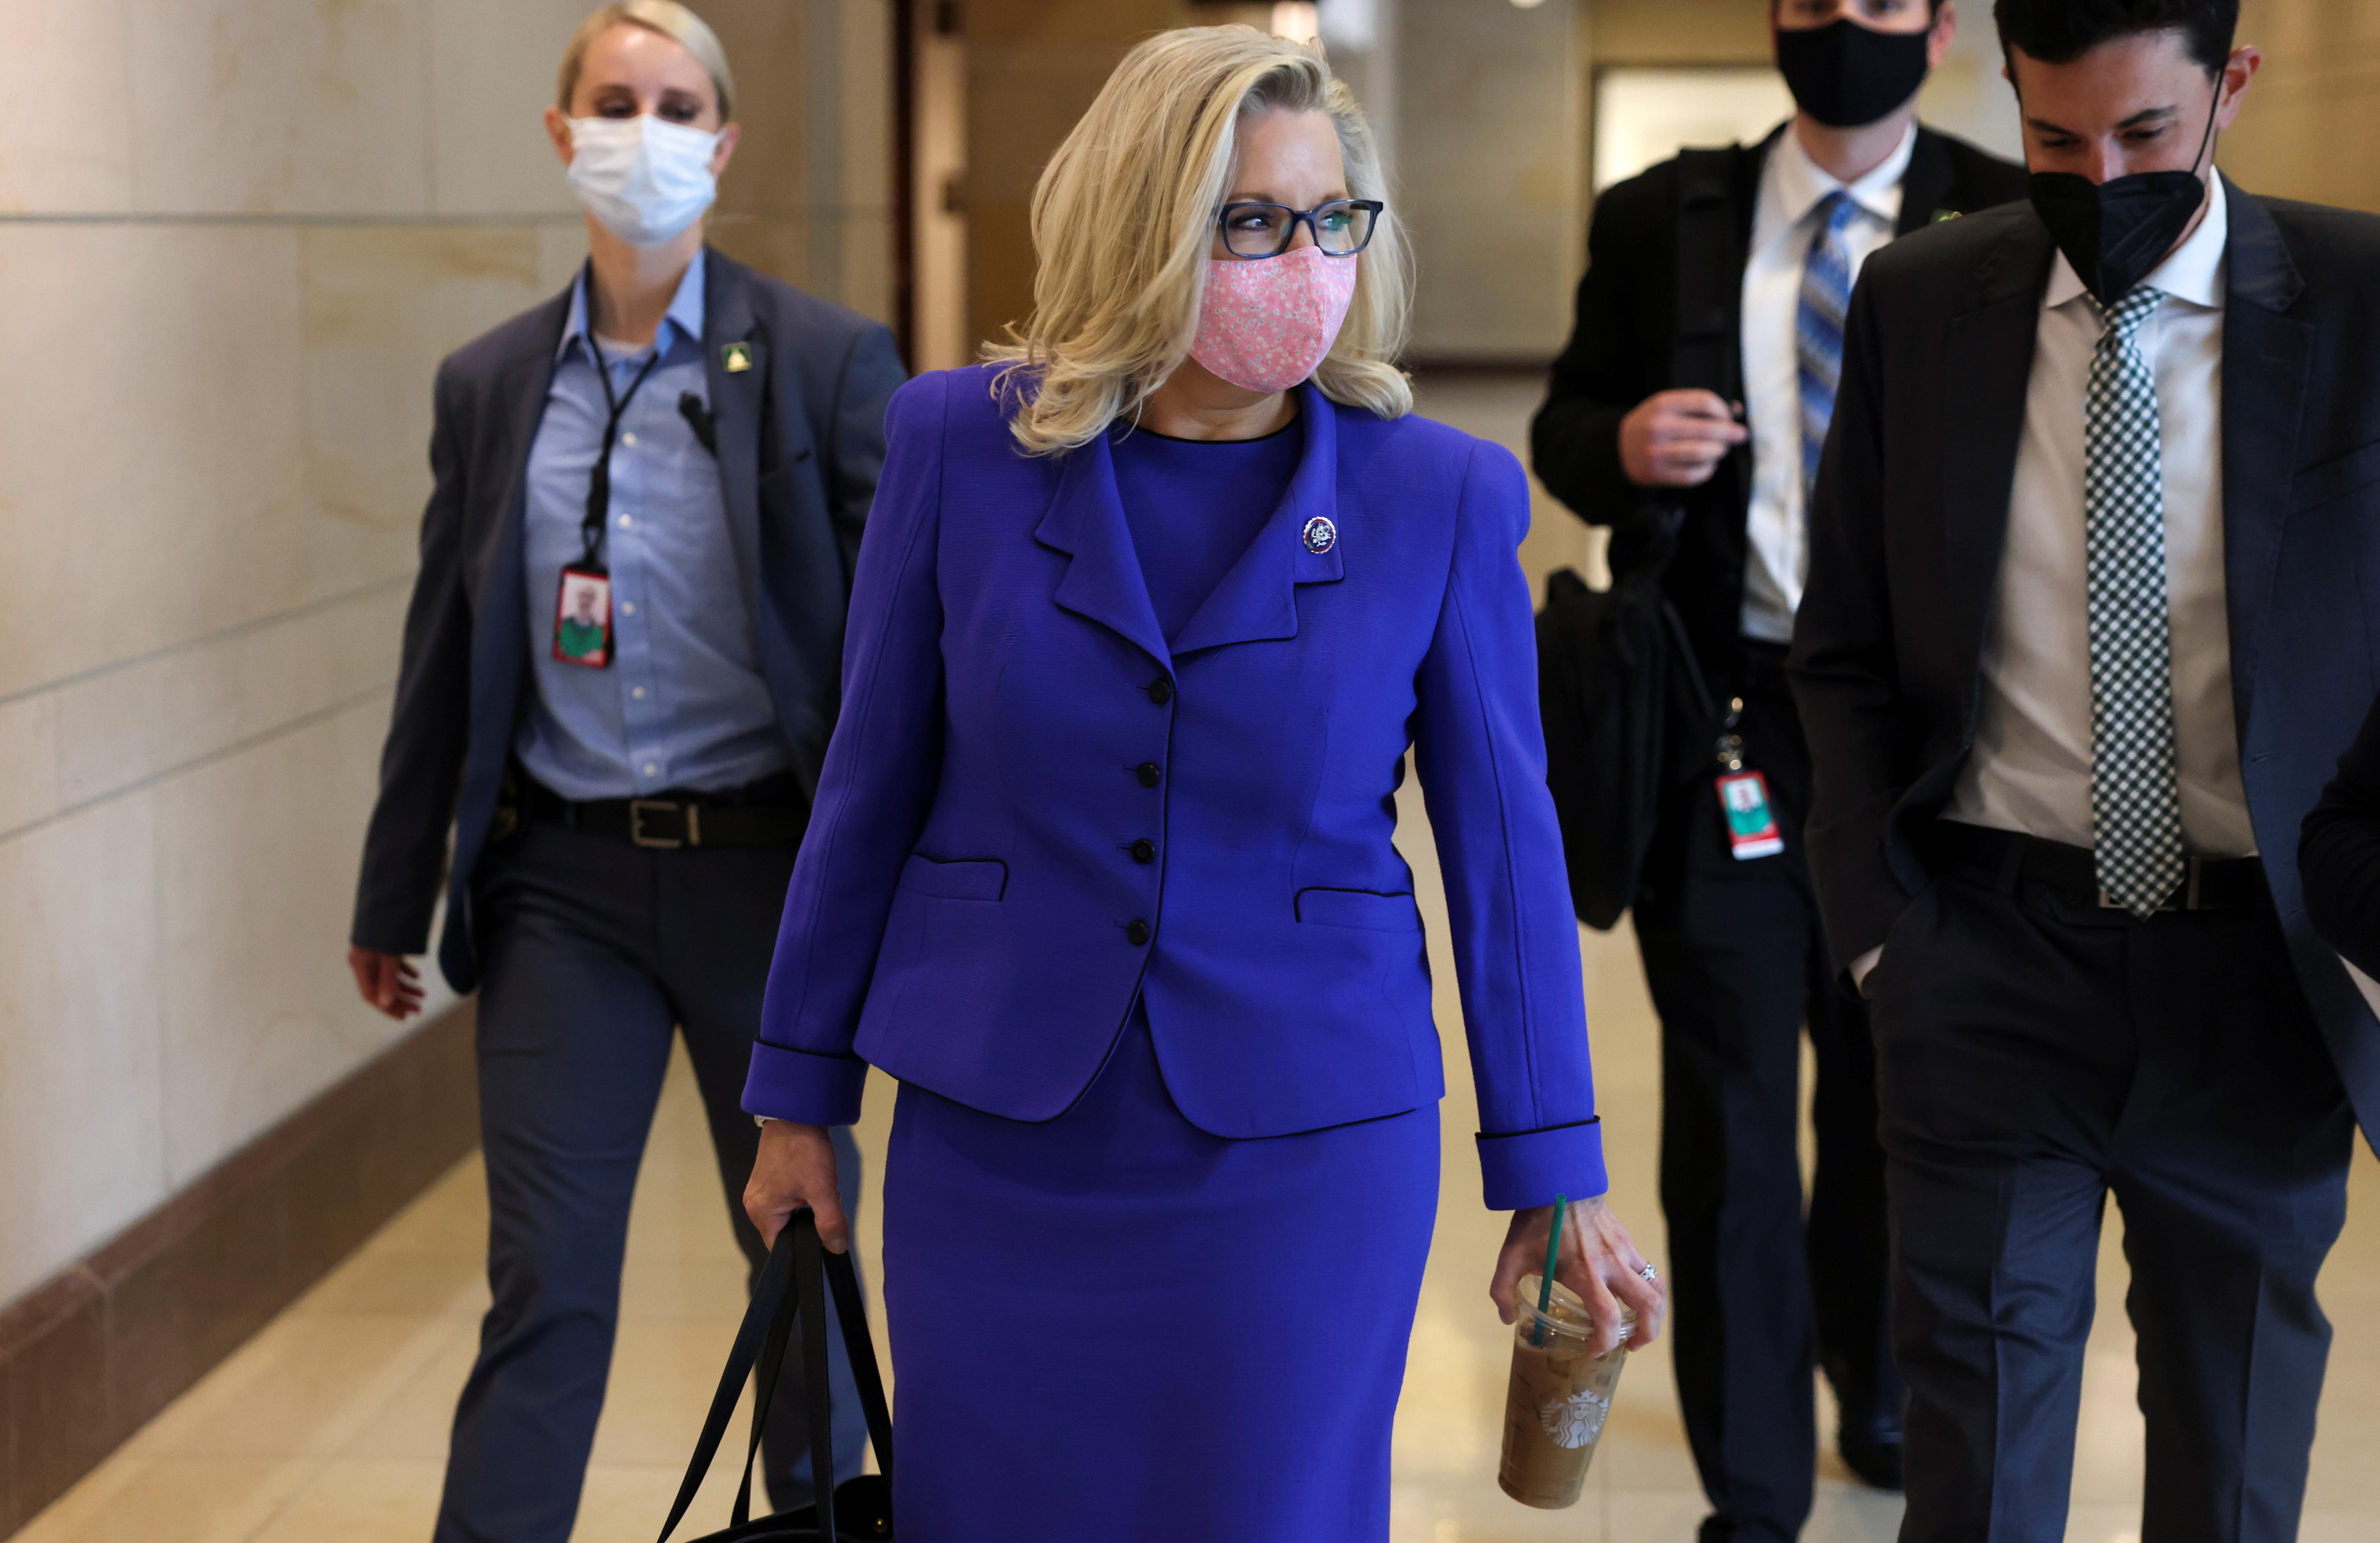 U.S. Representative Liz Cheney (R-WY) arrives on Capitol Hill in Washington, U.S., May 12, 2021. REUTERS/Evelyn Hockstein